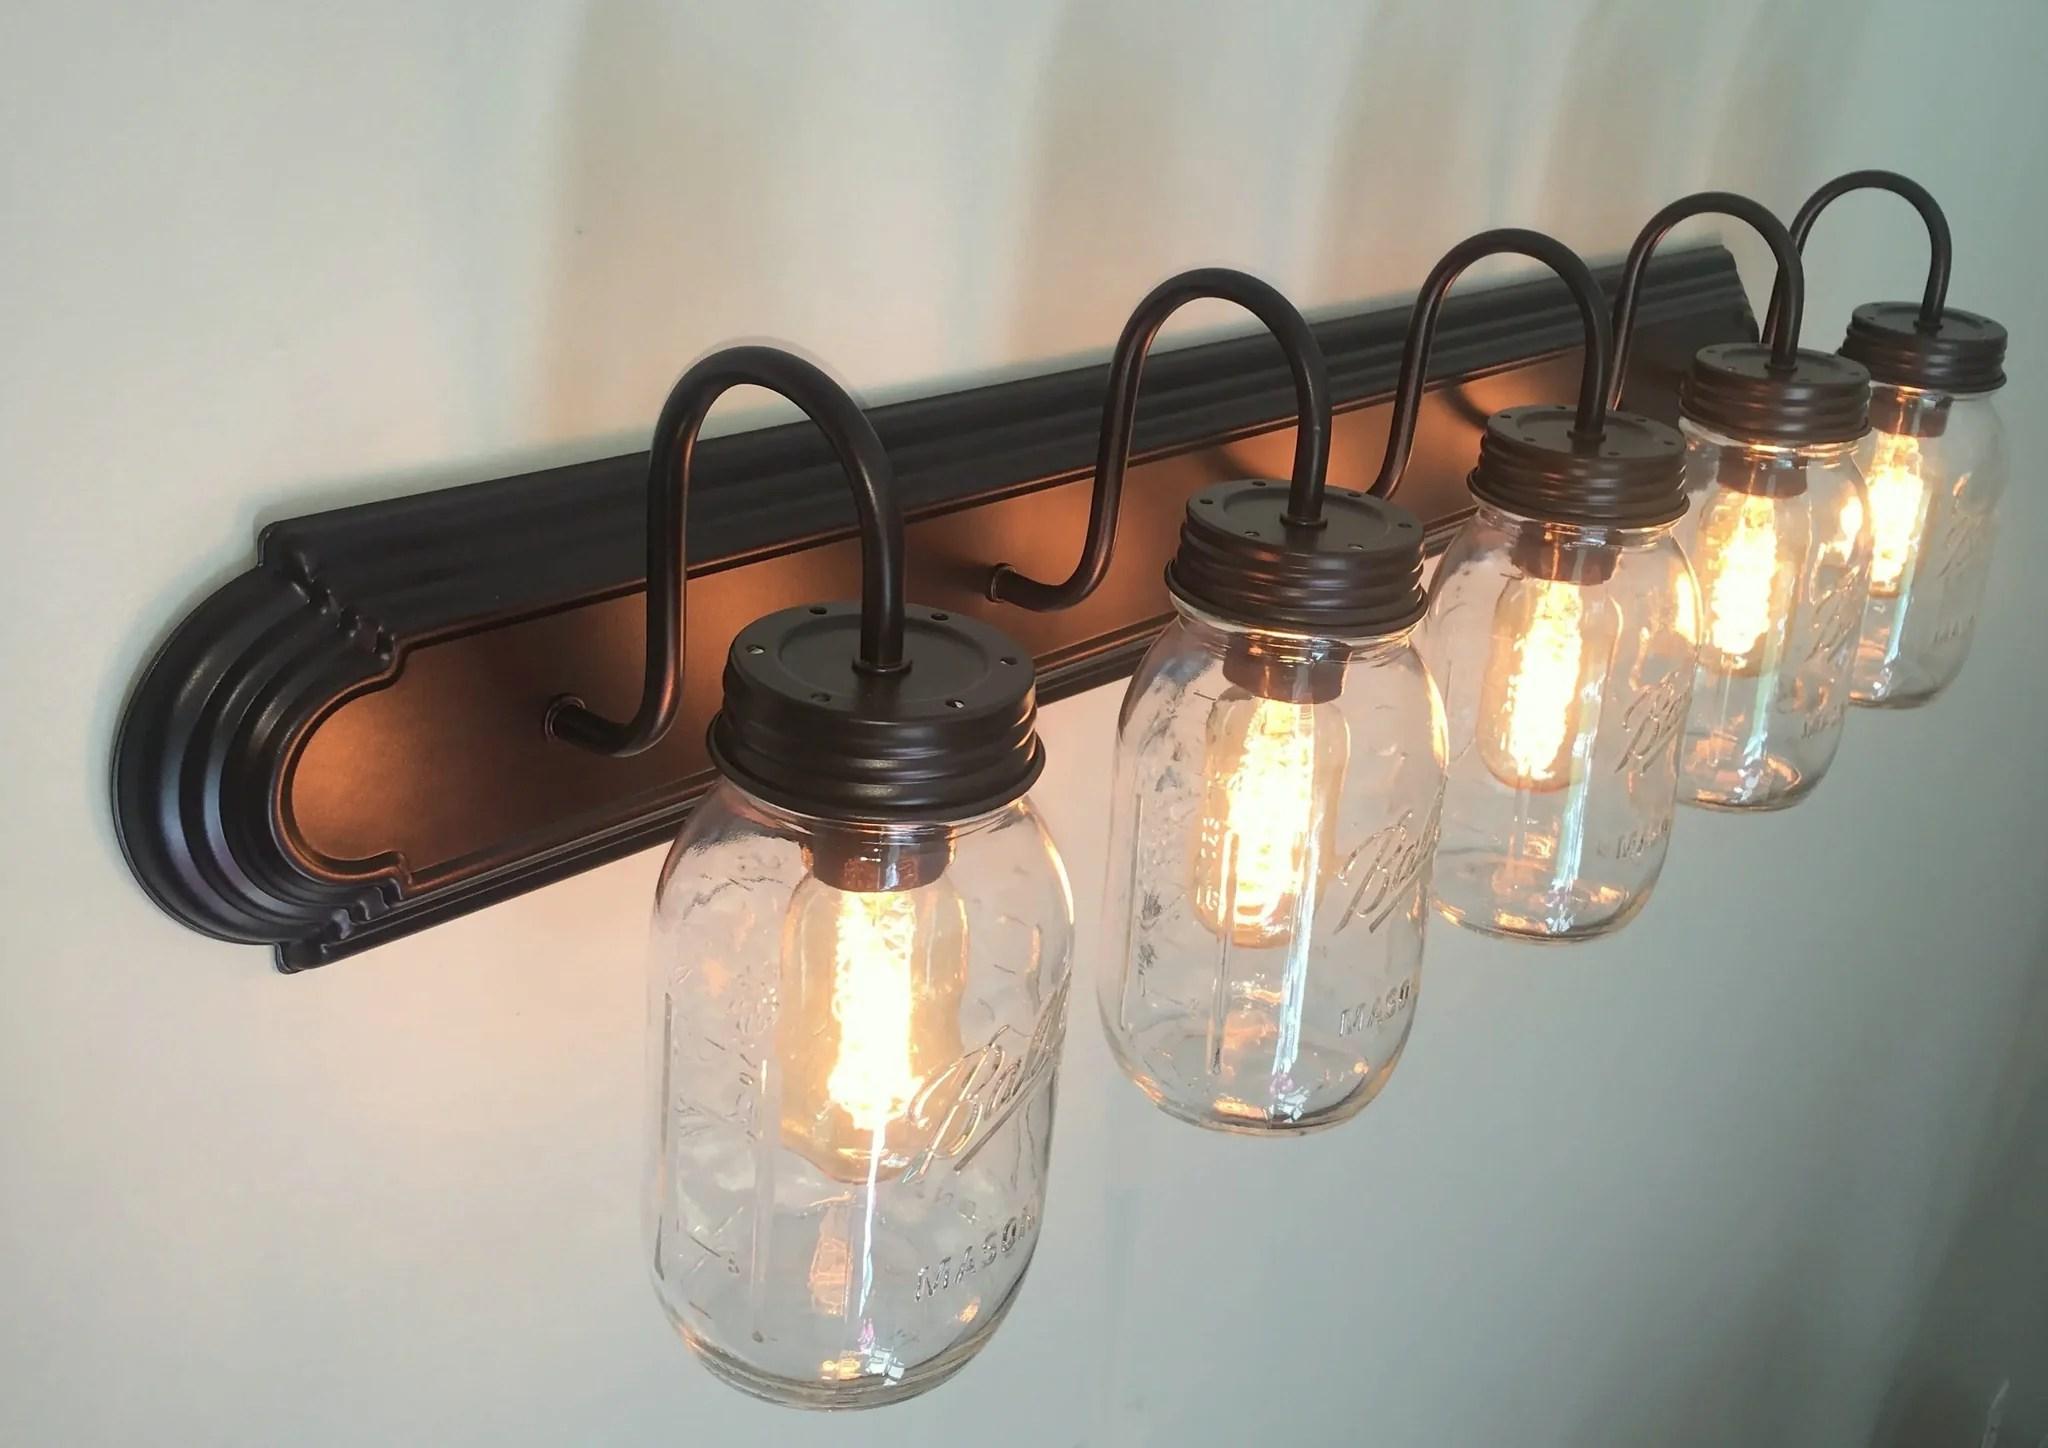 Mason Jar Bathroom Vanity 5Light Wall Sconce Fixture  The Lamp Goods